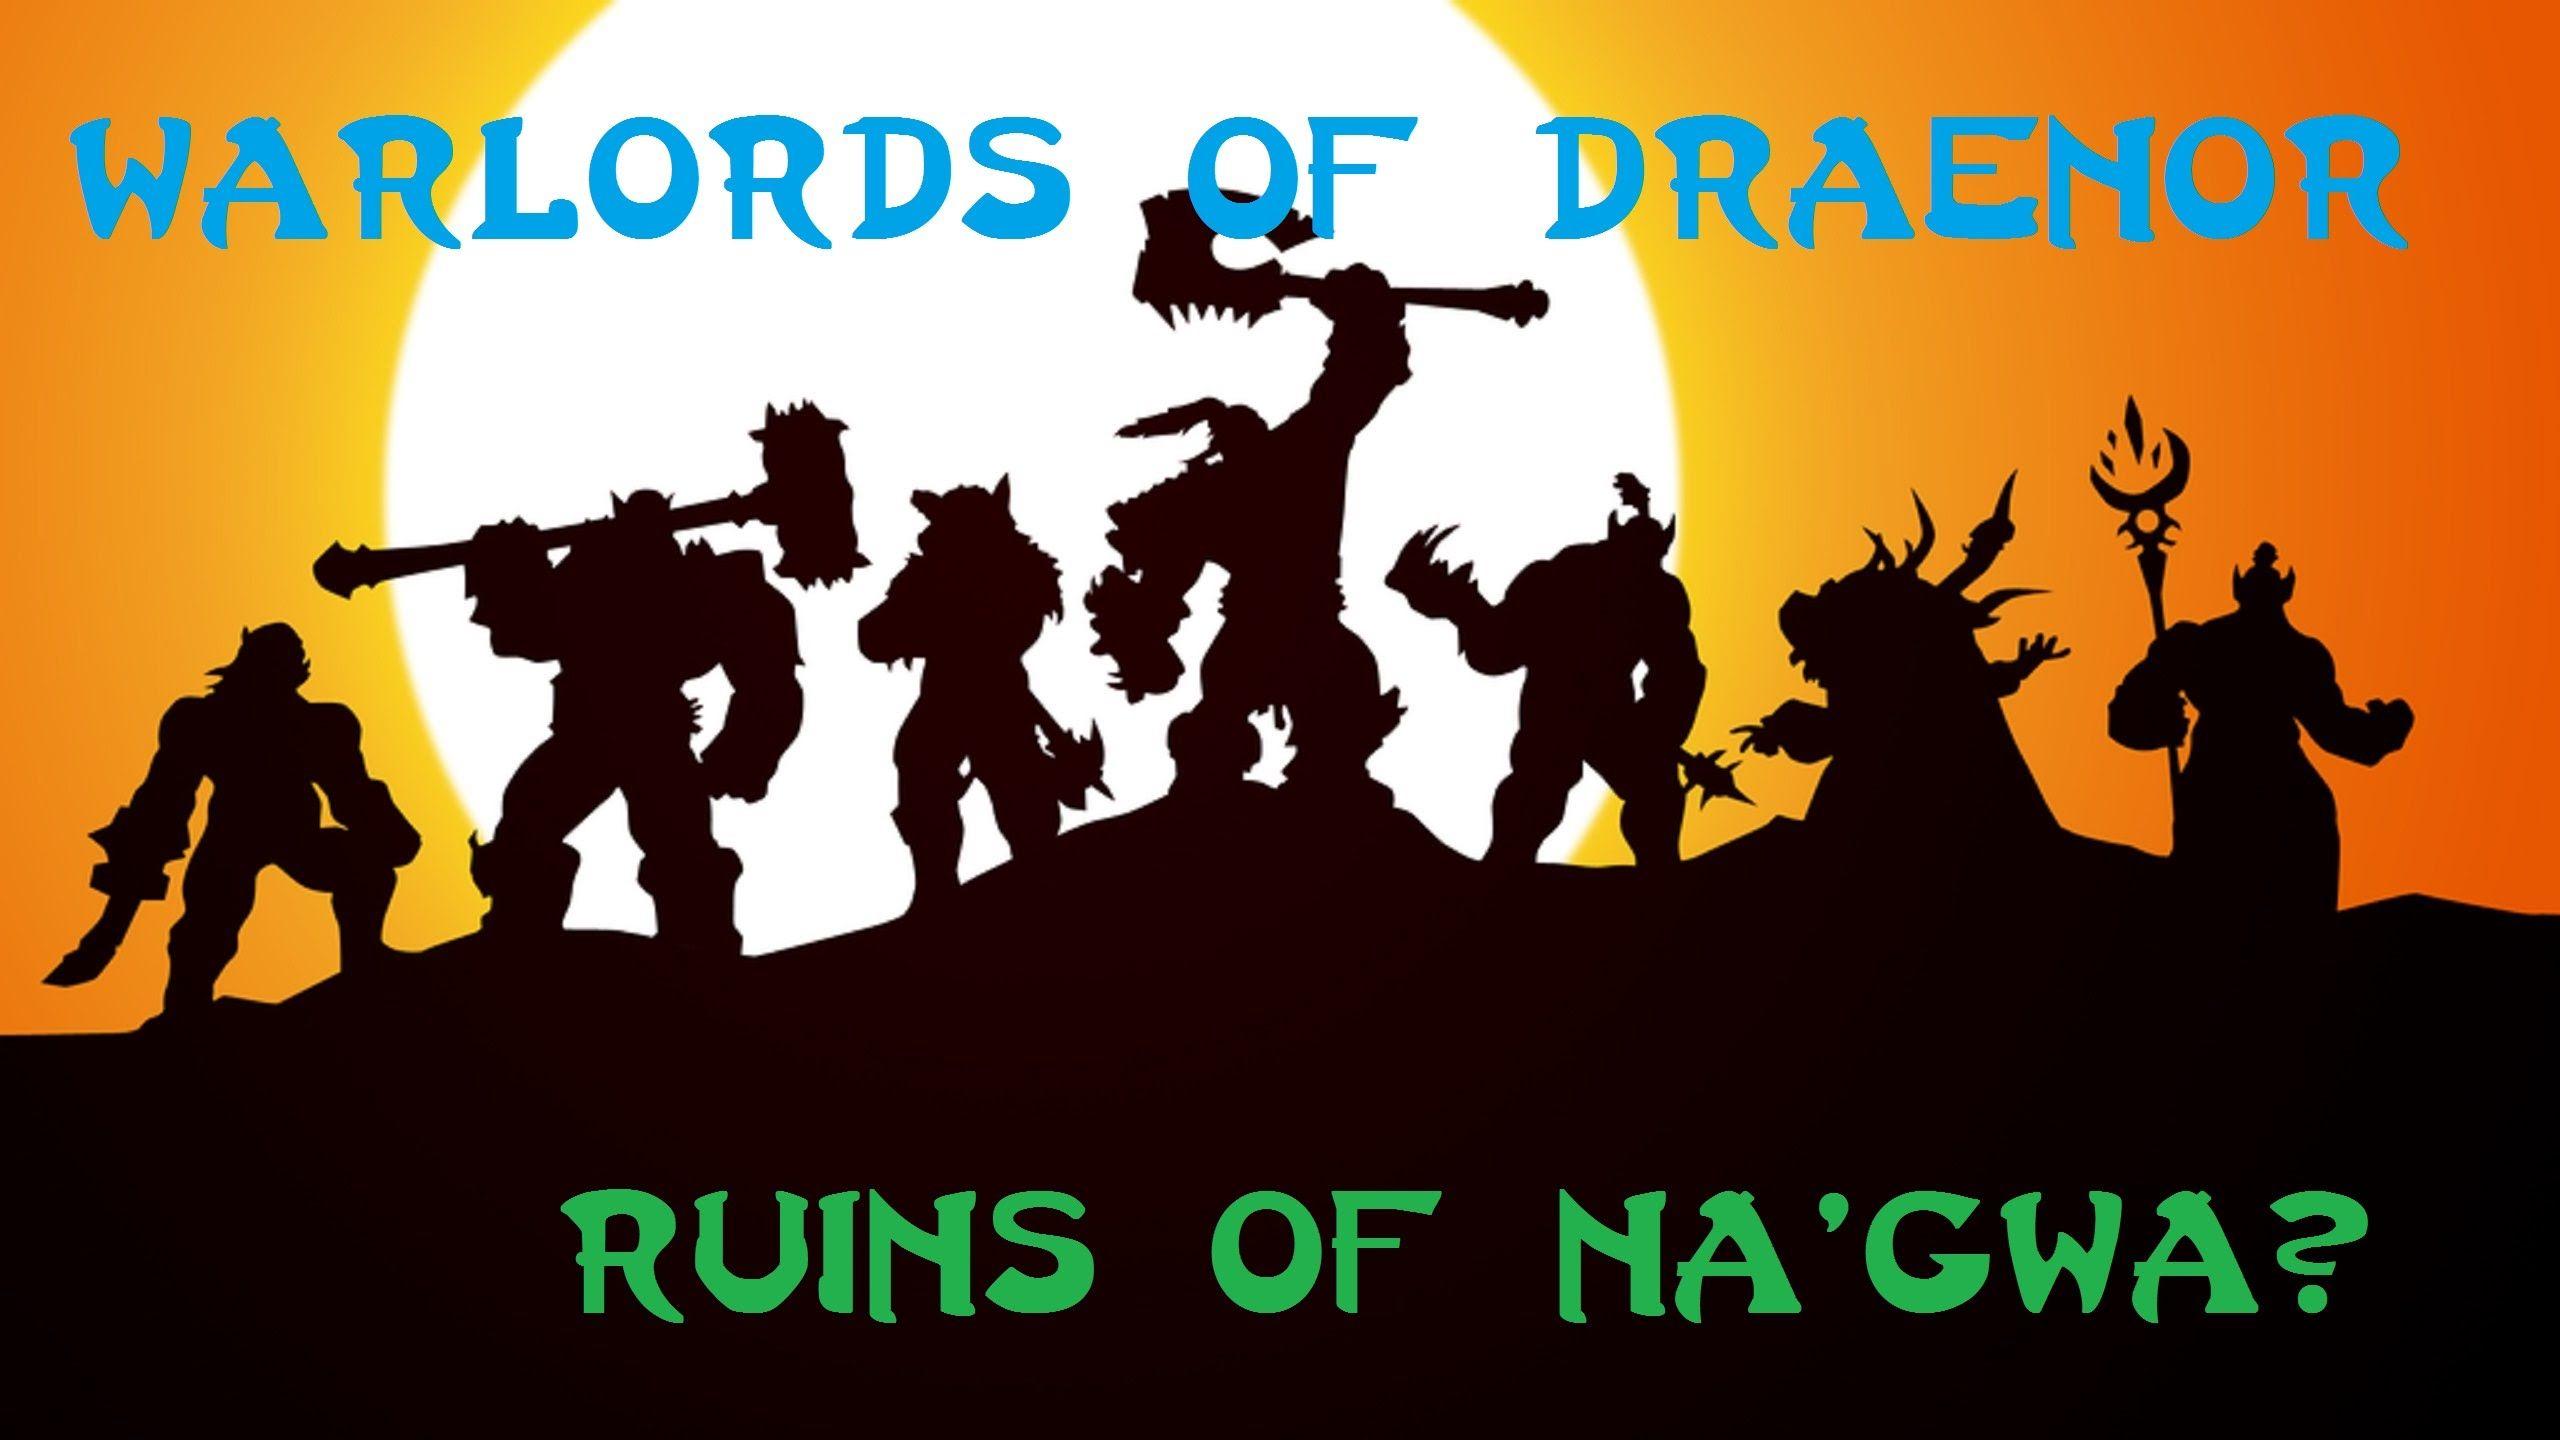 cool World of Warcraft Warlords of Draenor: Ruins of Na'gwa